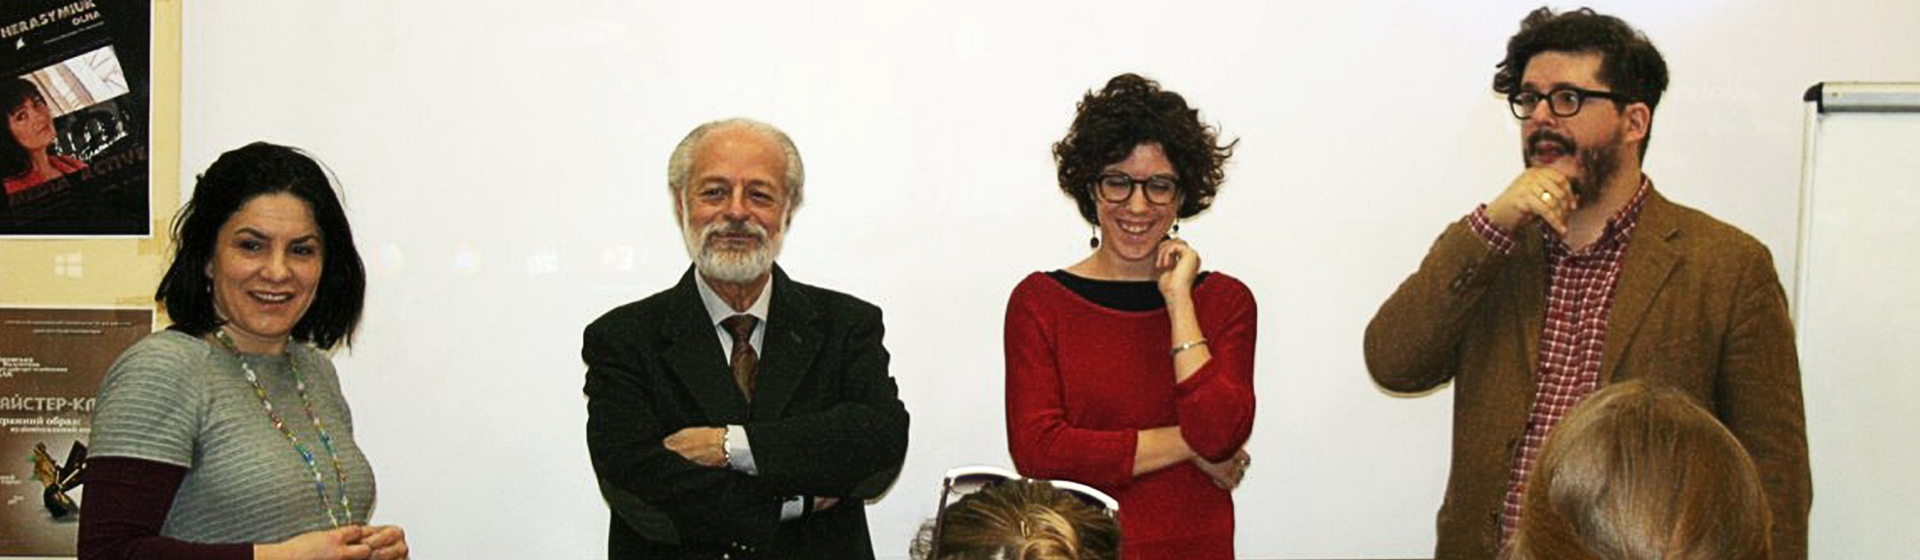 Італійські професори на кафедрі медіакомунікацій